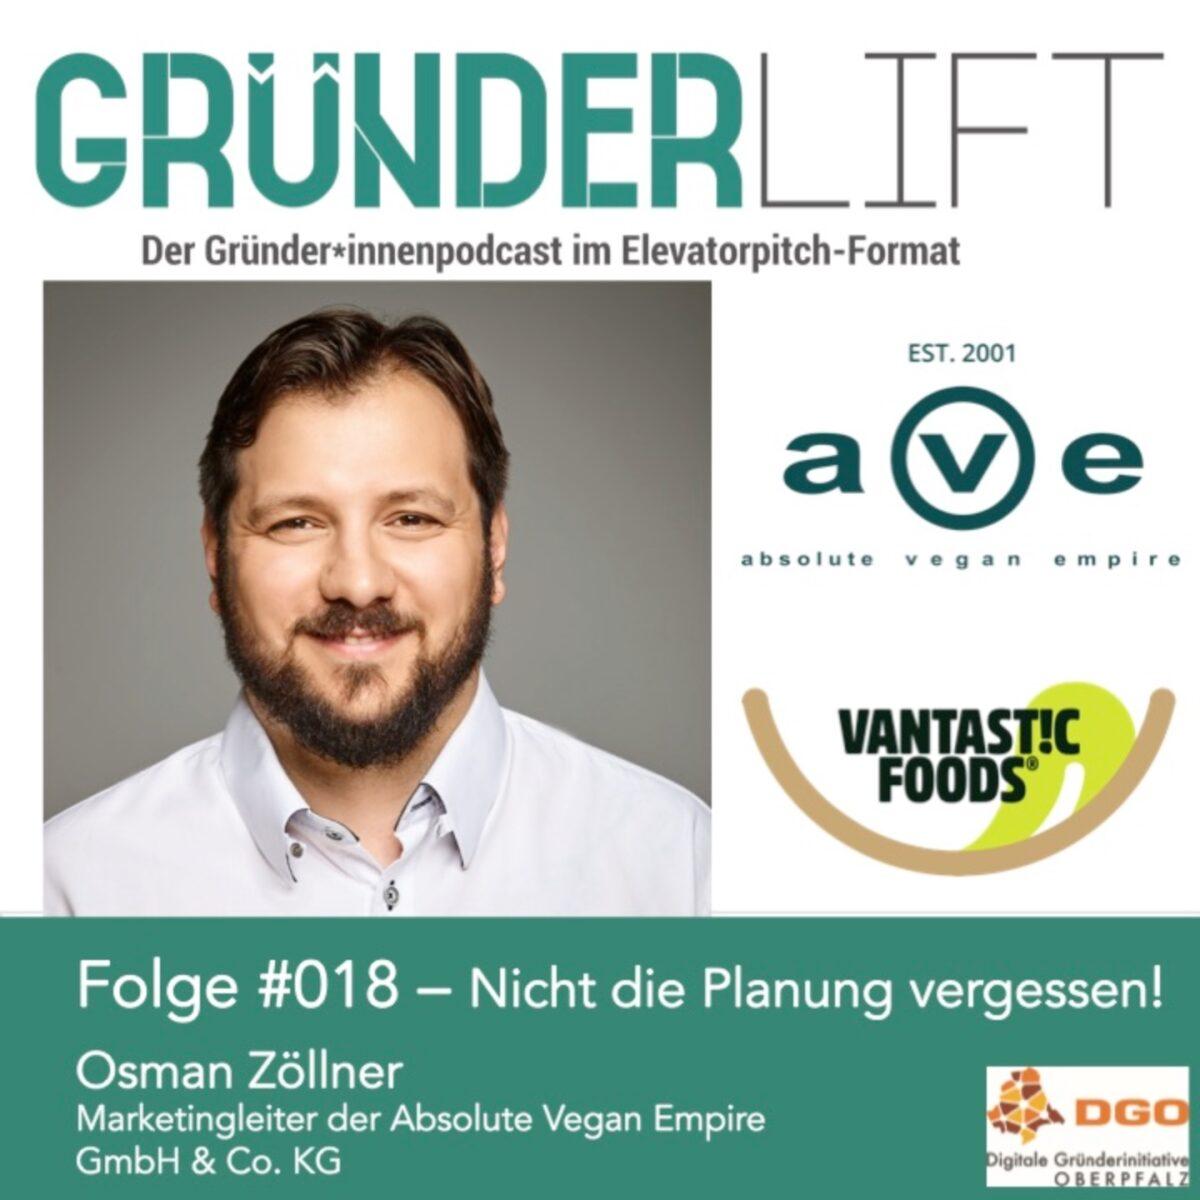 Osman Zöllner erzählt im Gründerlift von Absolute Vegan Empire Vantastic Foods